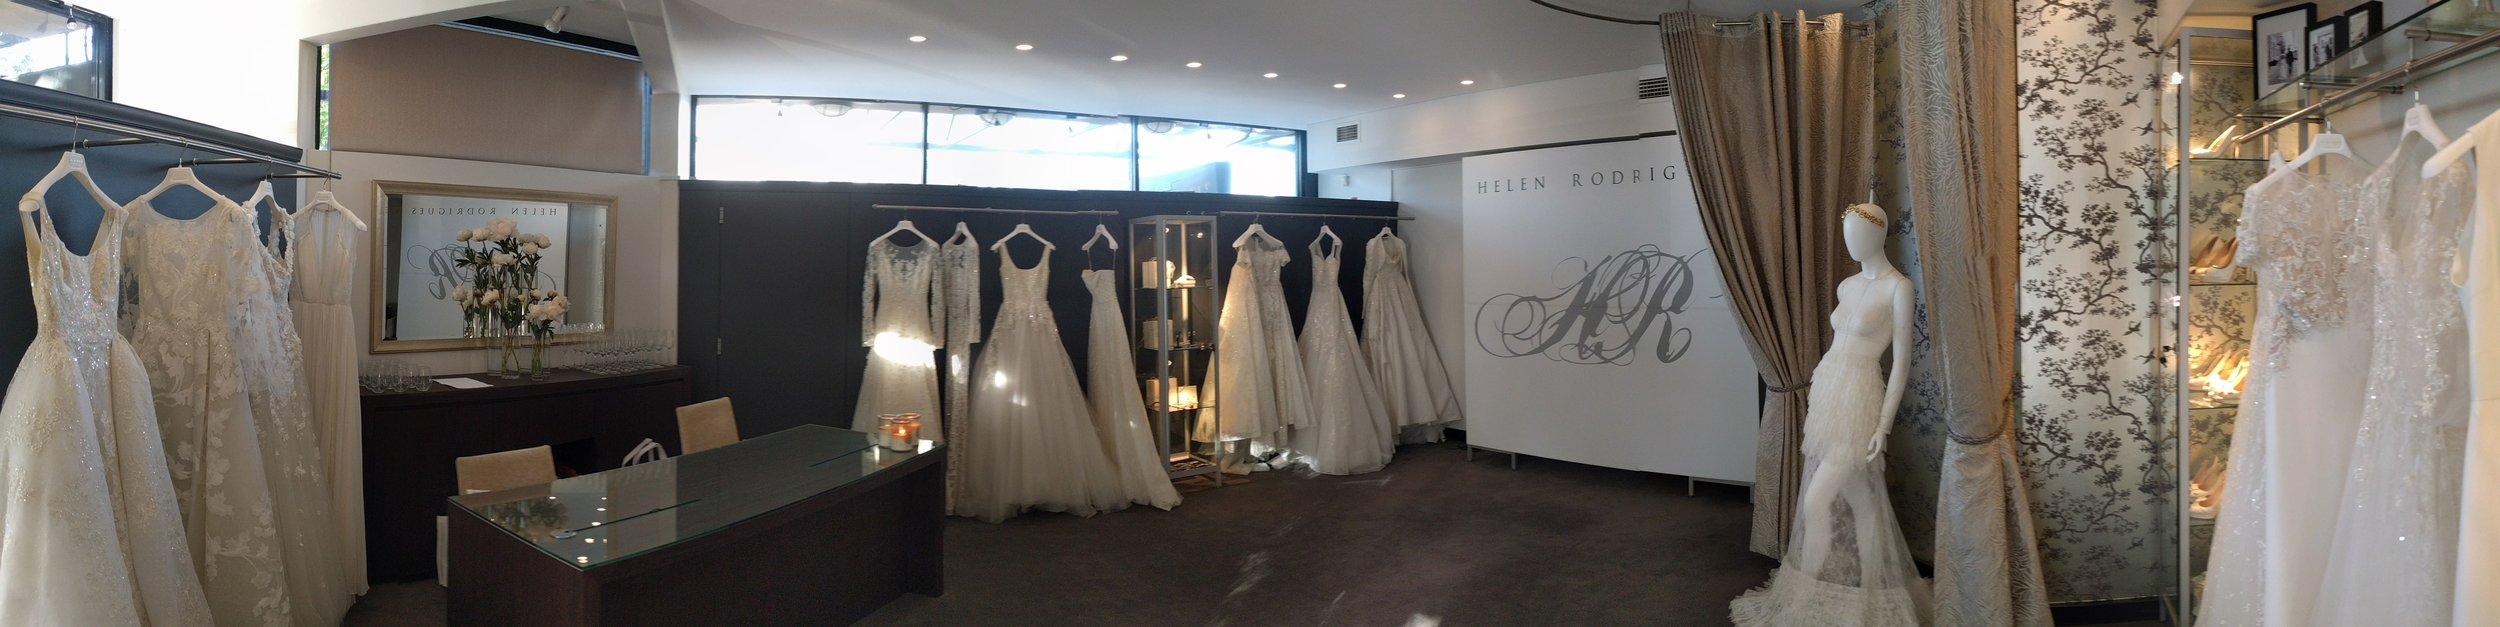 helen-rodrigues-boutique-elie-saab-bridal-presentation.jpg